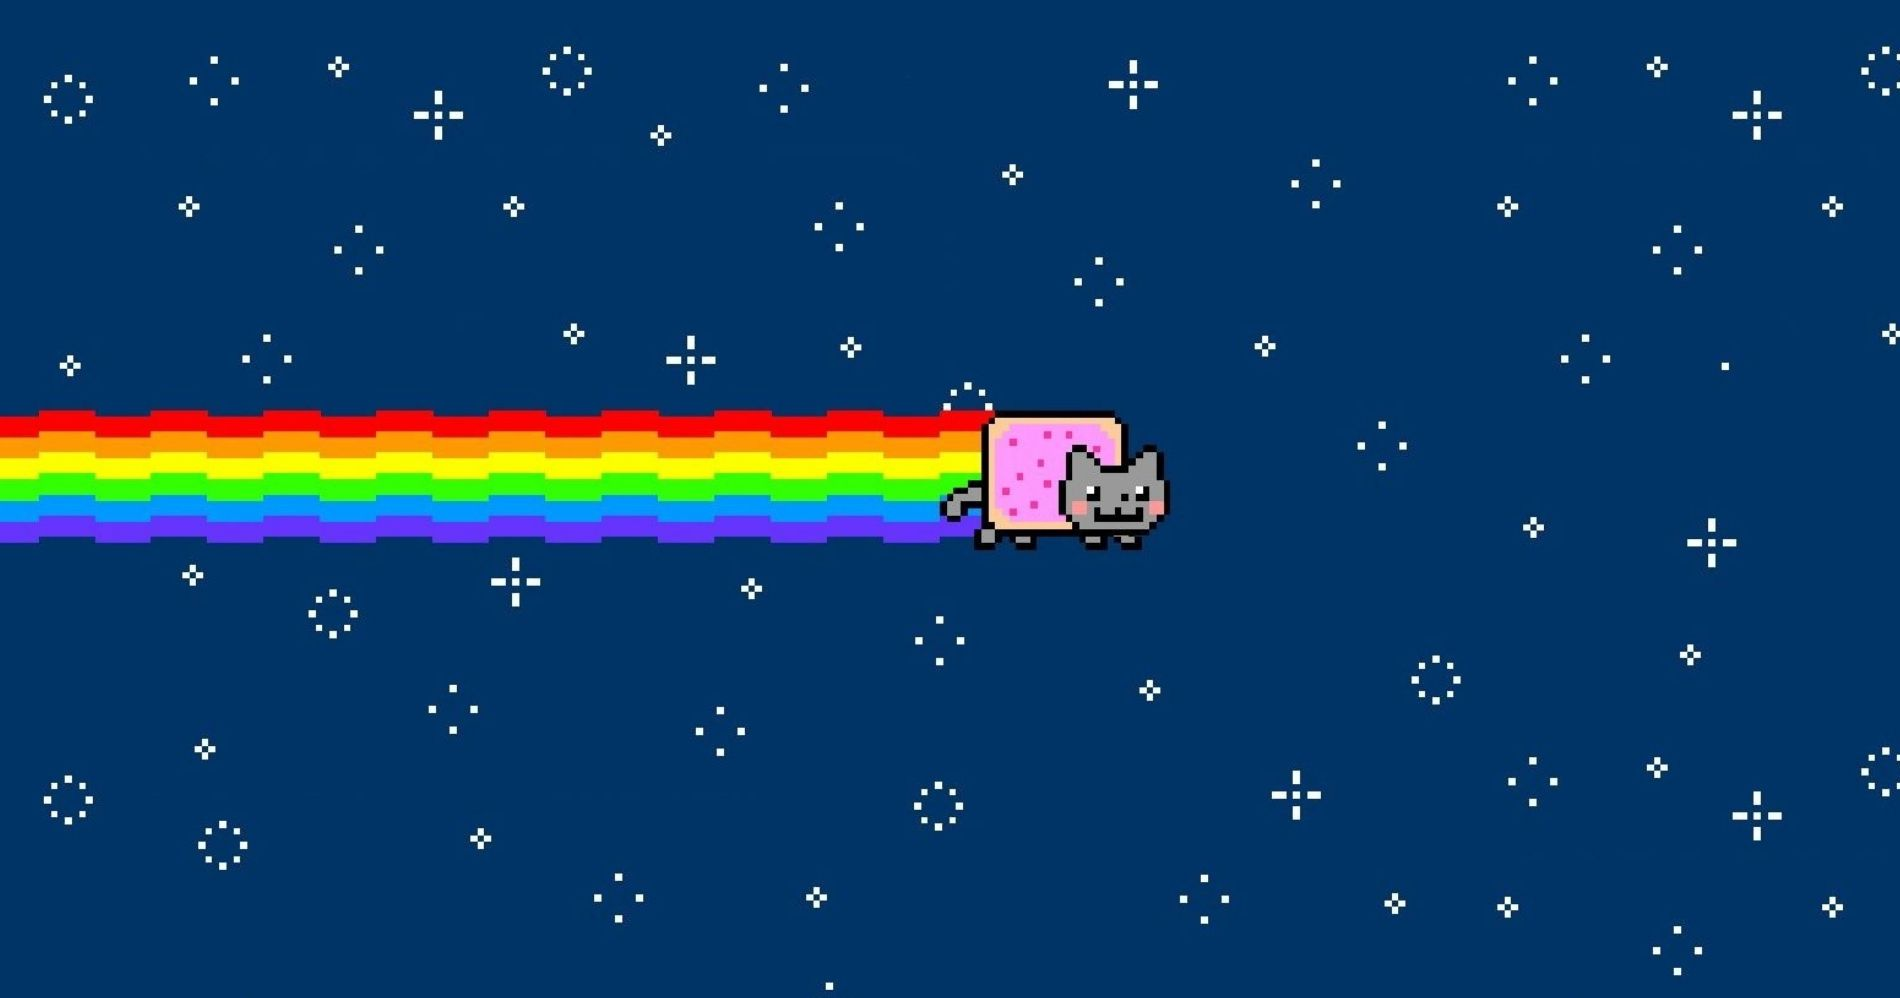 Meme Nyan Cat - Image: Google